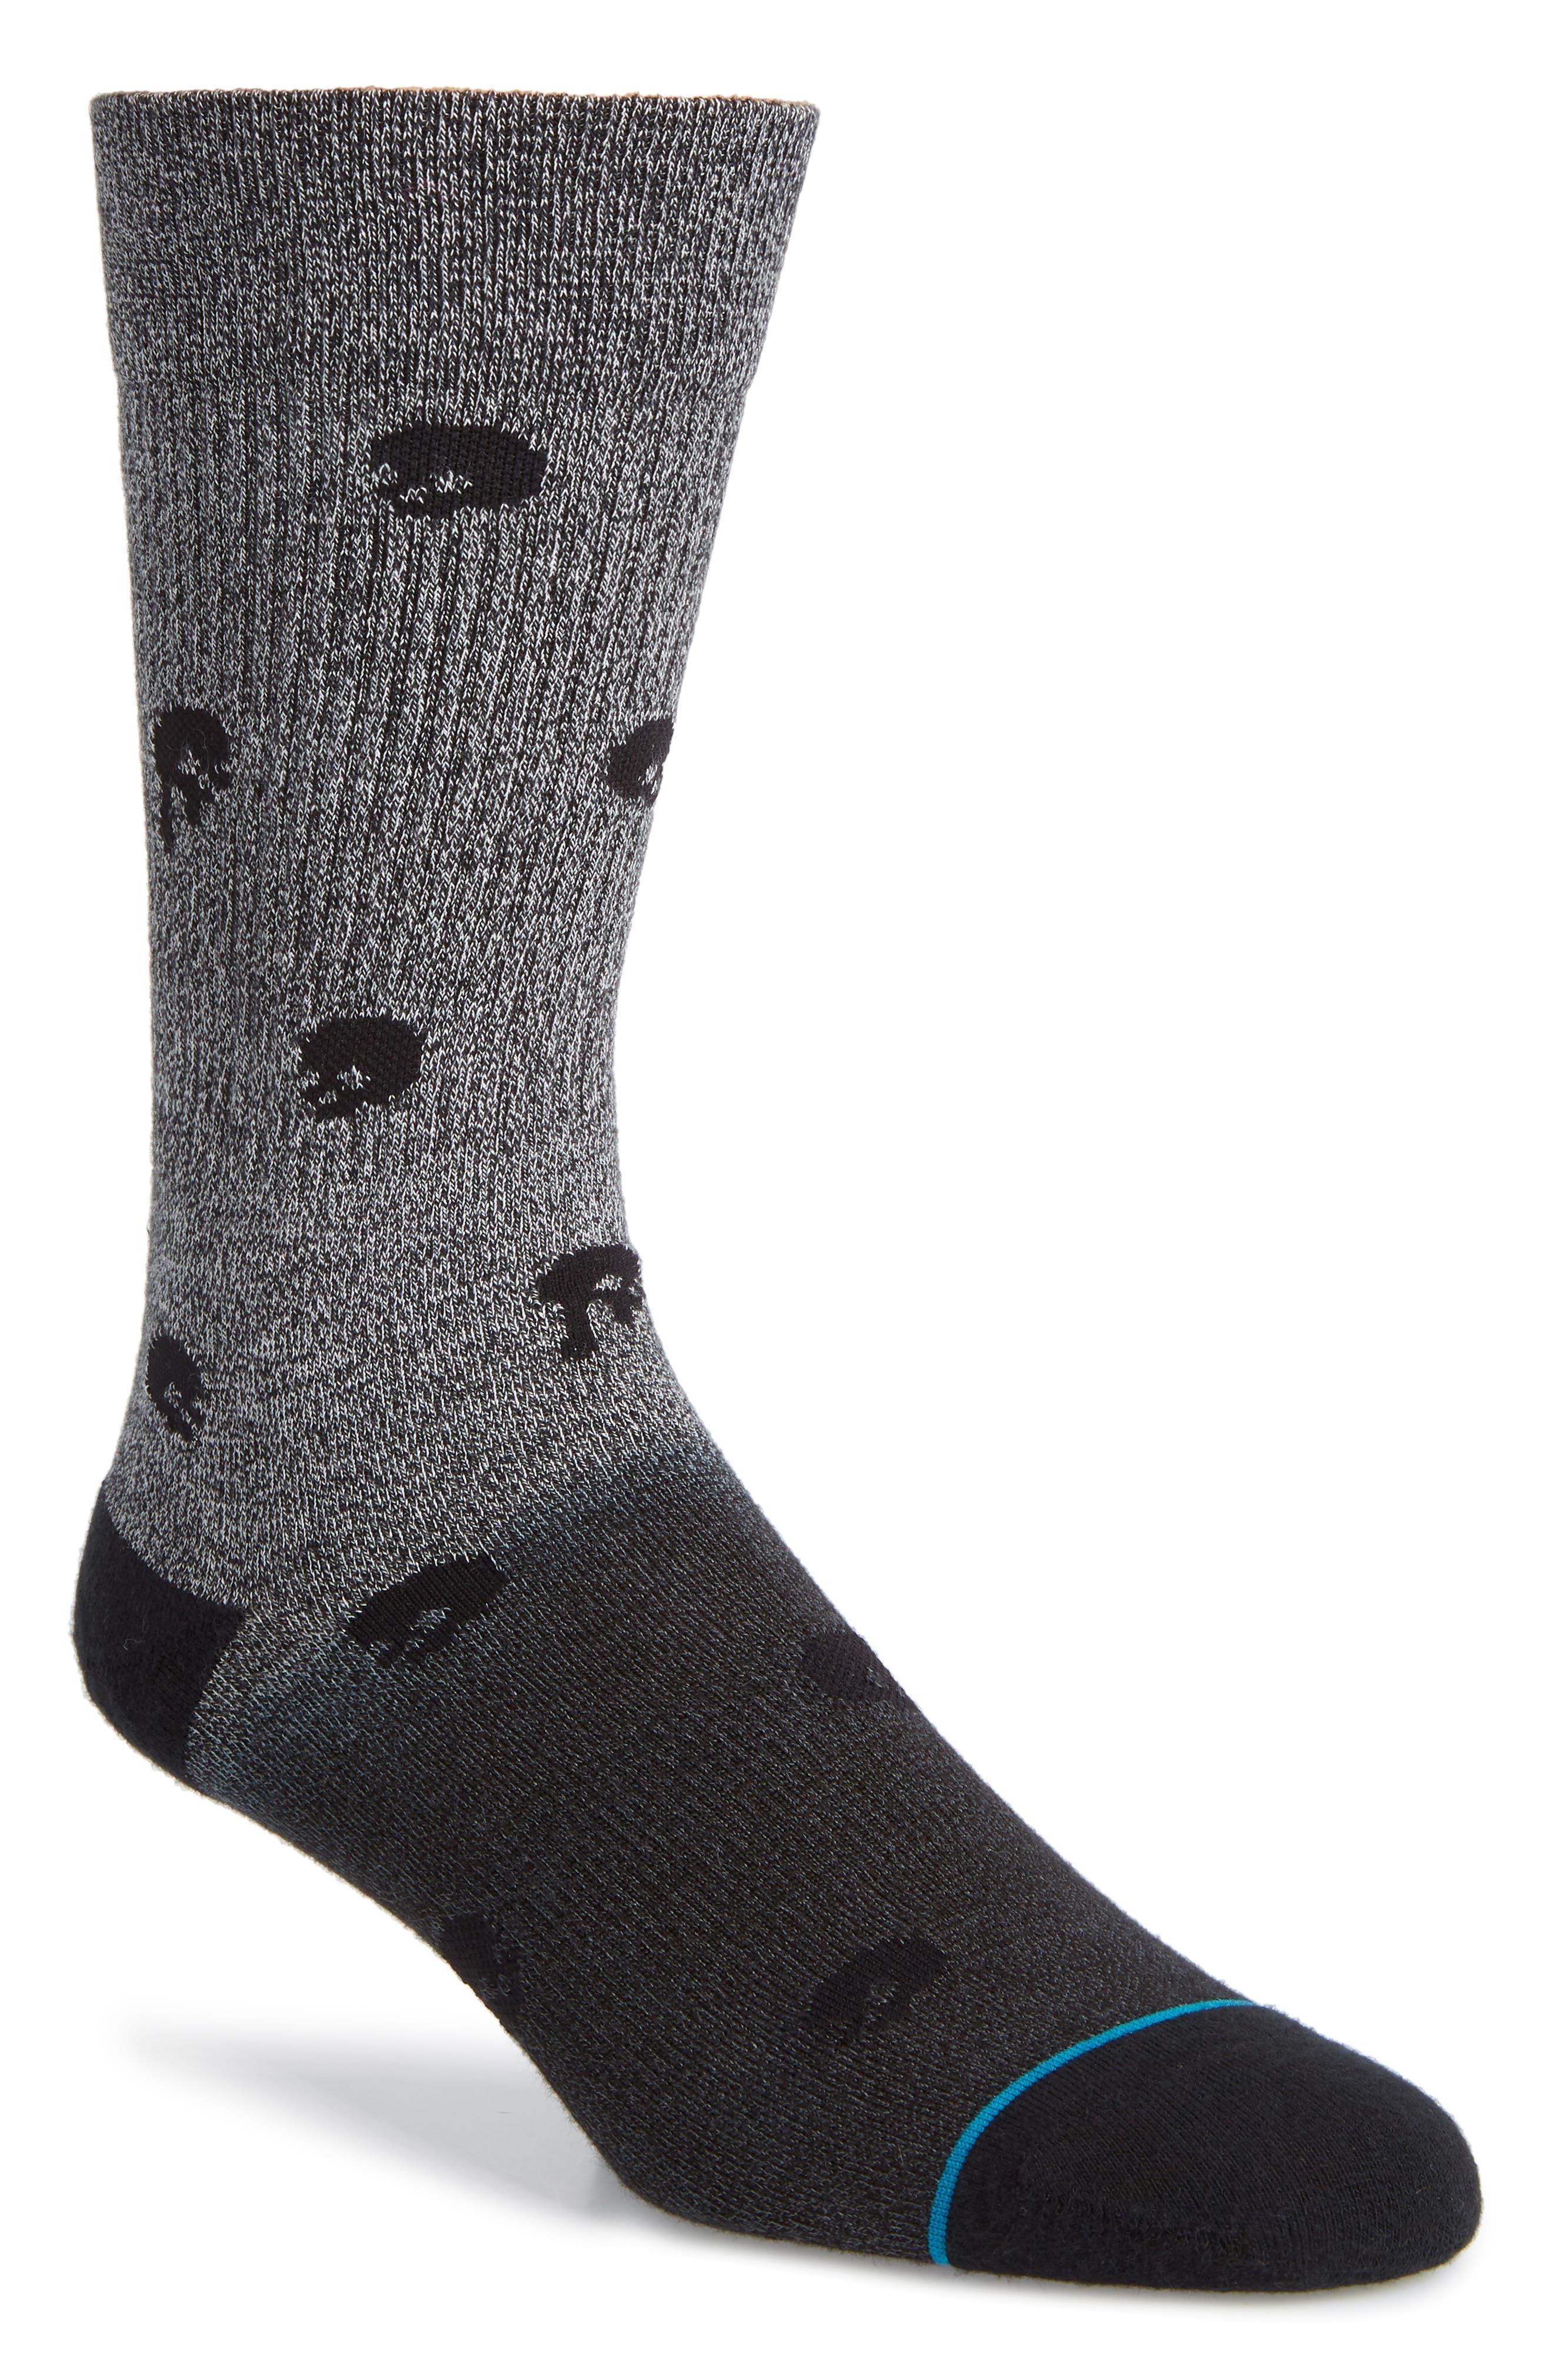 Polkanot Socks,                             Main thumbnail 1, color,                             BLACK